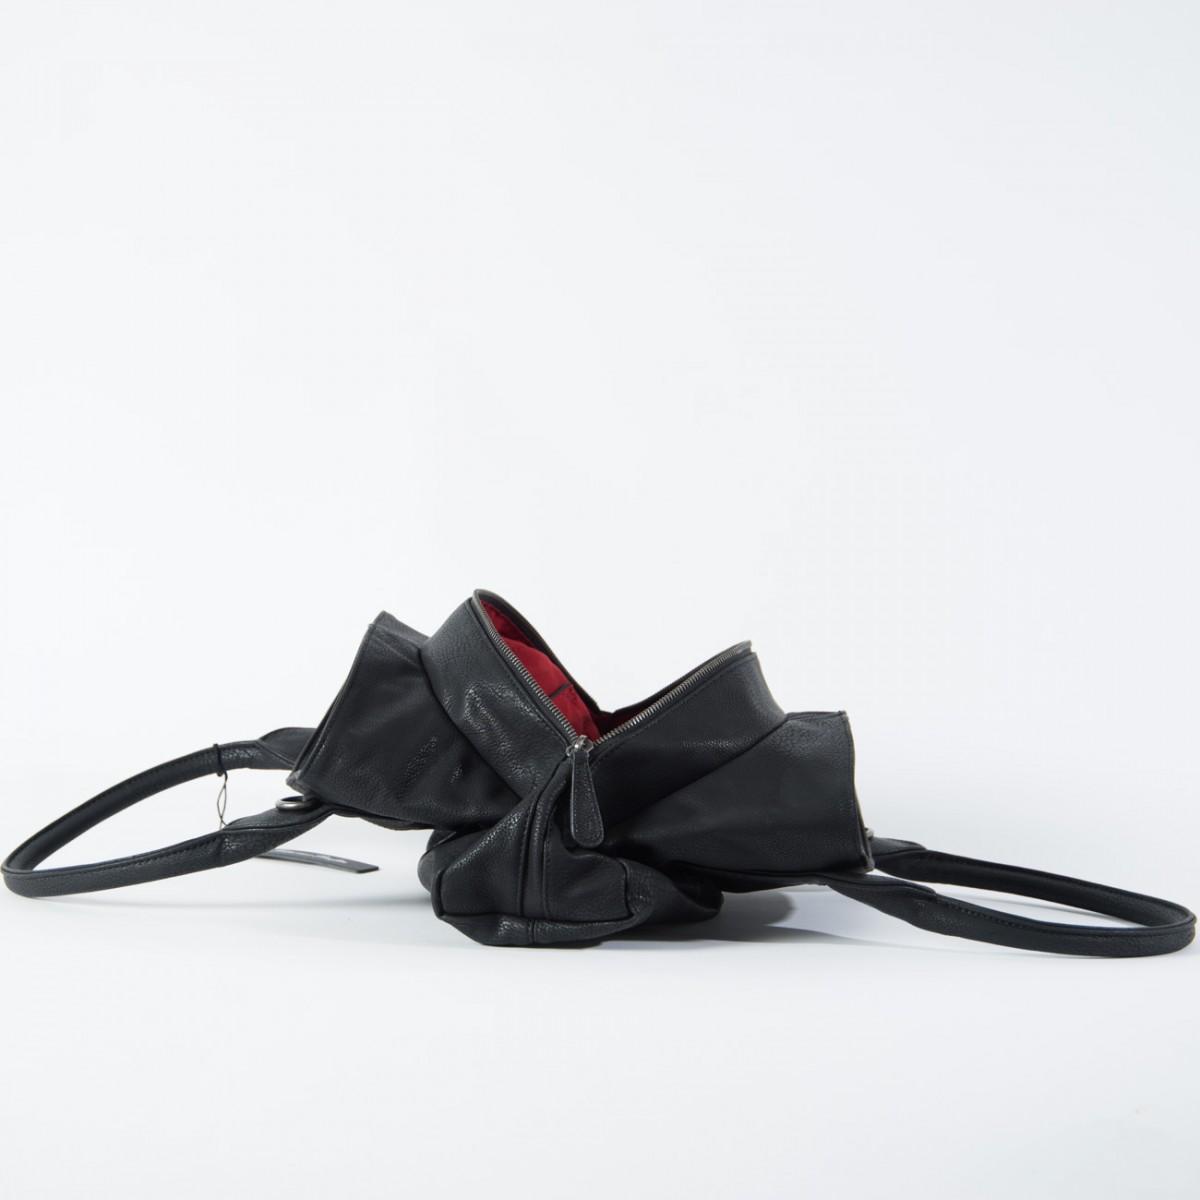 fritzi aus preu en handtasche liselotte berlin black schwarz bild. Black Bedroom Furniture Sets. Home Design Ideas